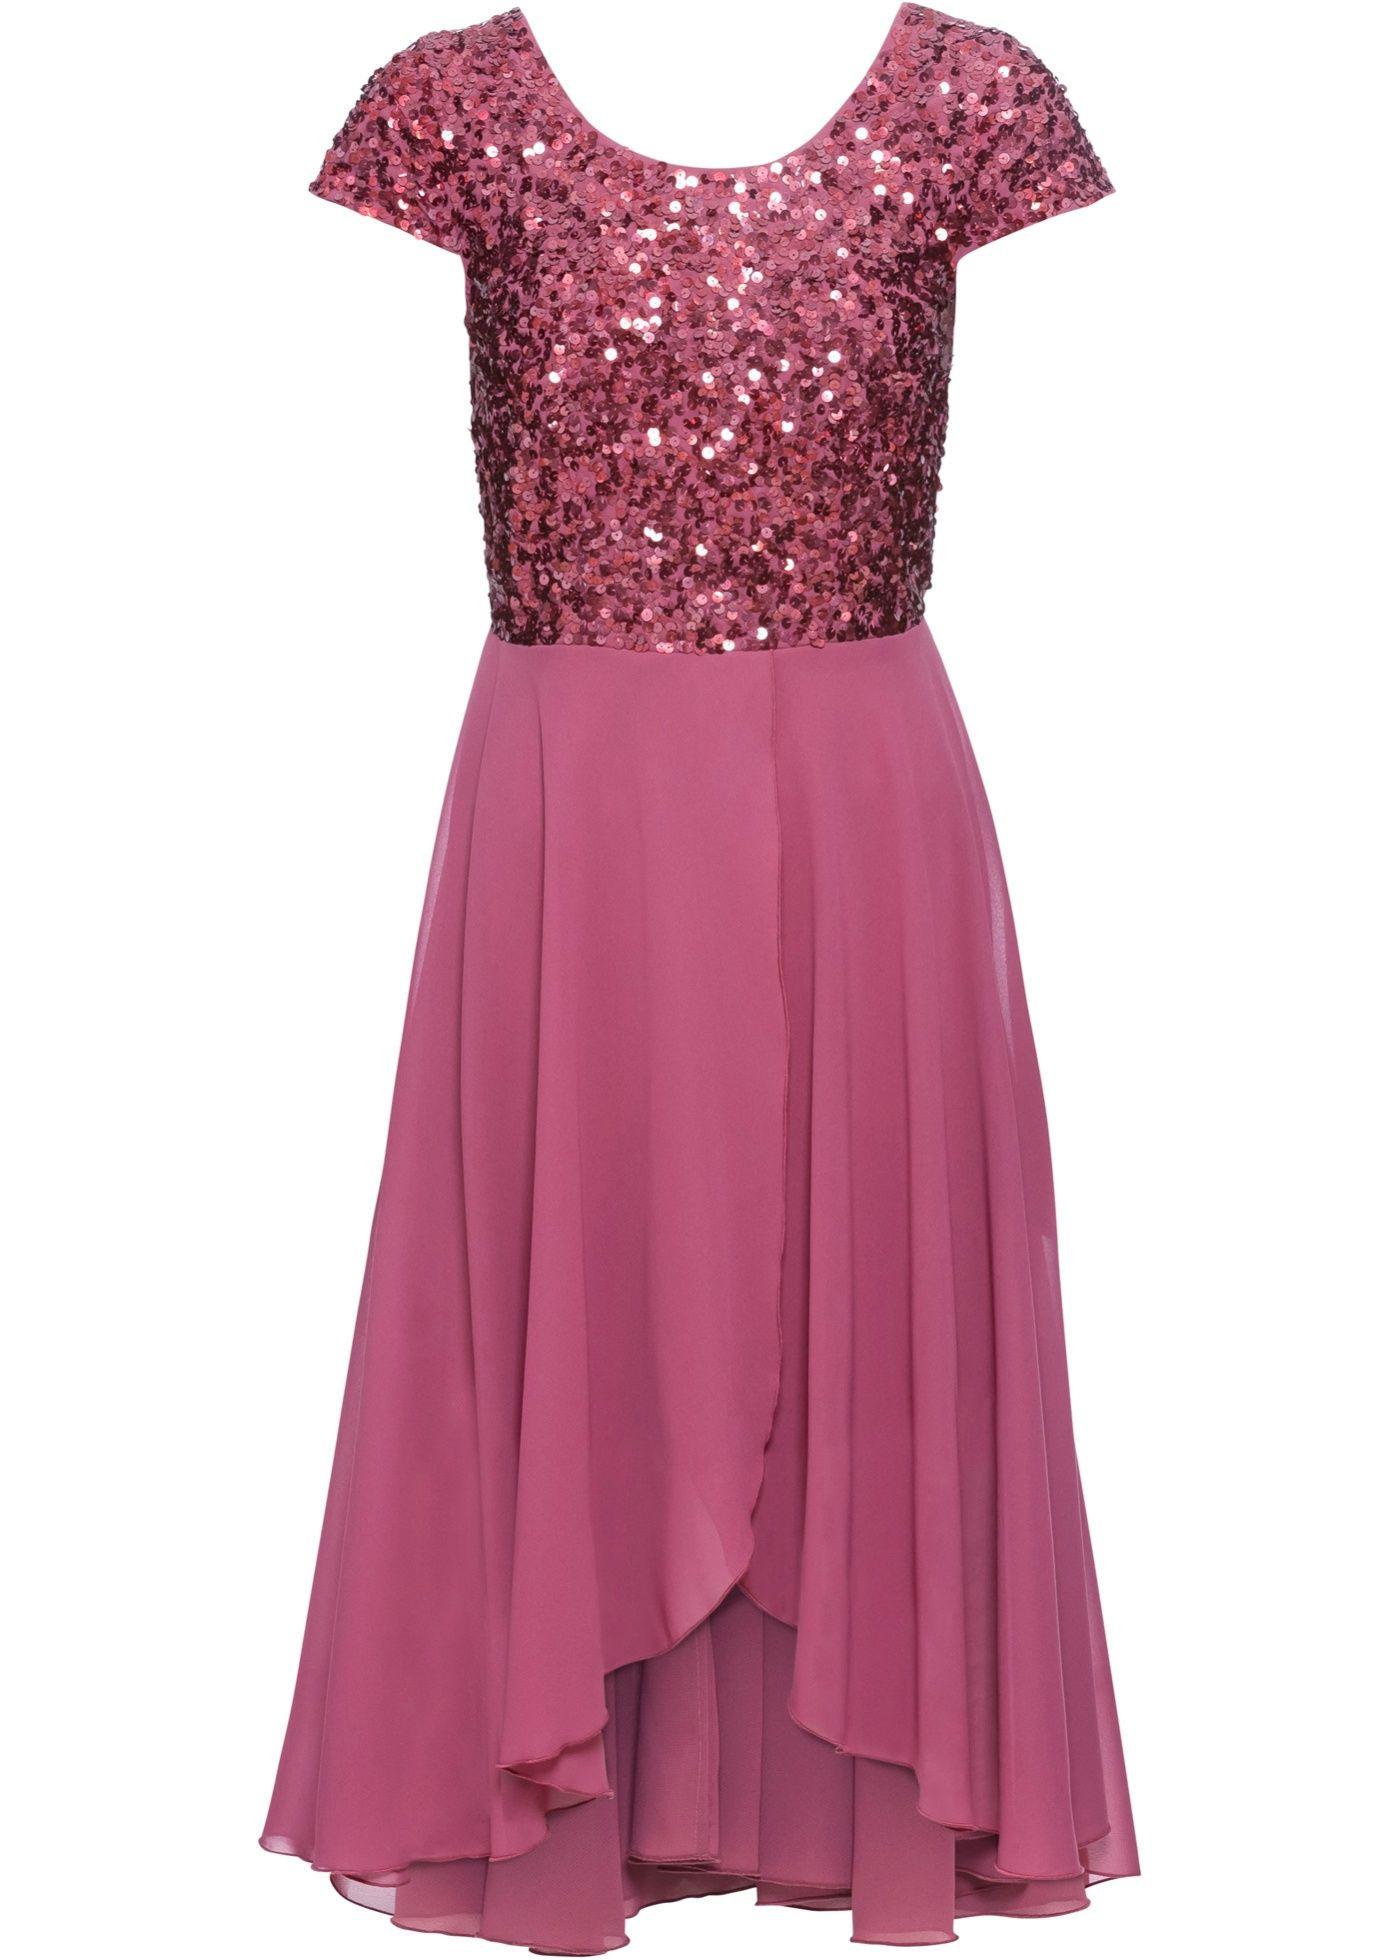 Formal Genial Abend-Vokuhila-Kleid Bester Preis13 Perfekt Abend-Vokuhila-Kleid für 2019